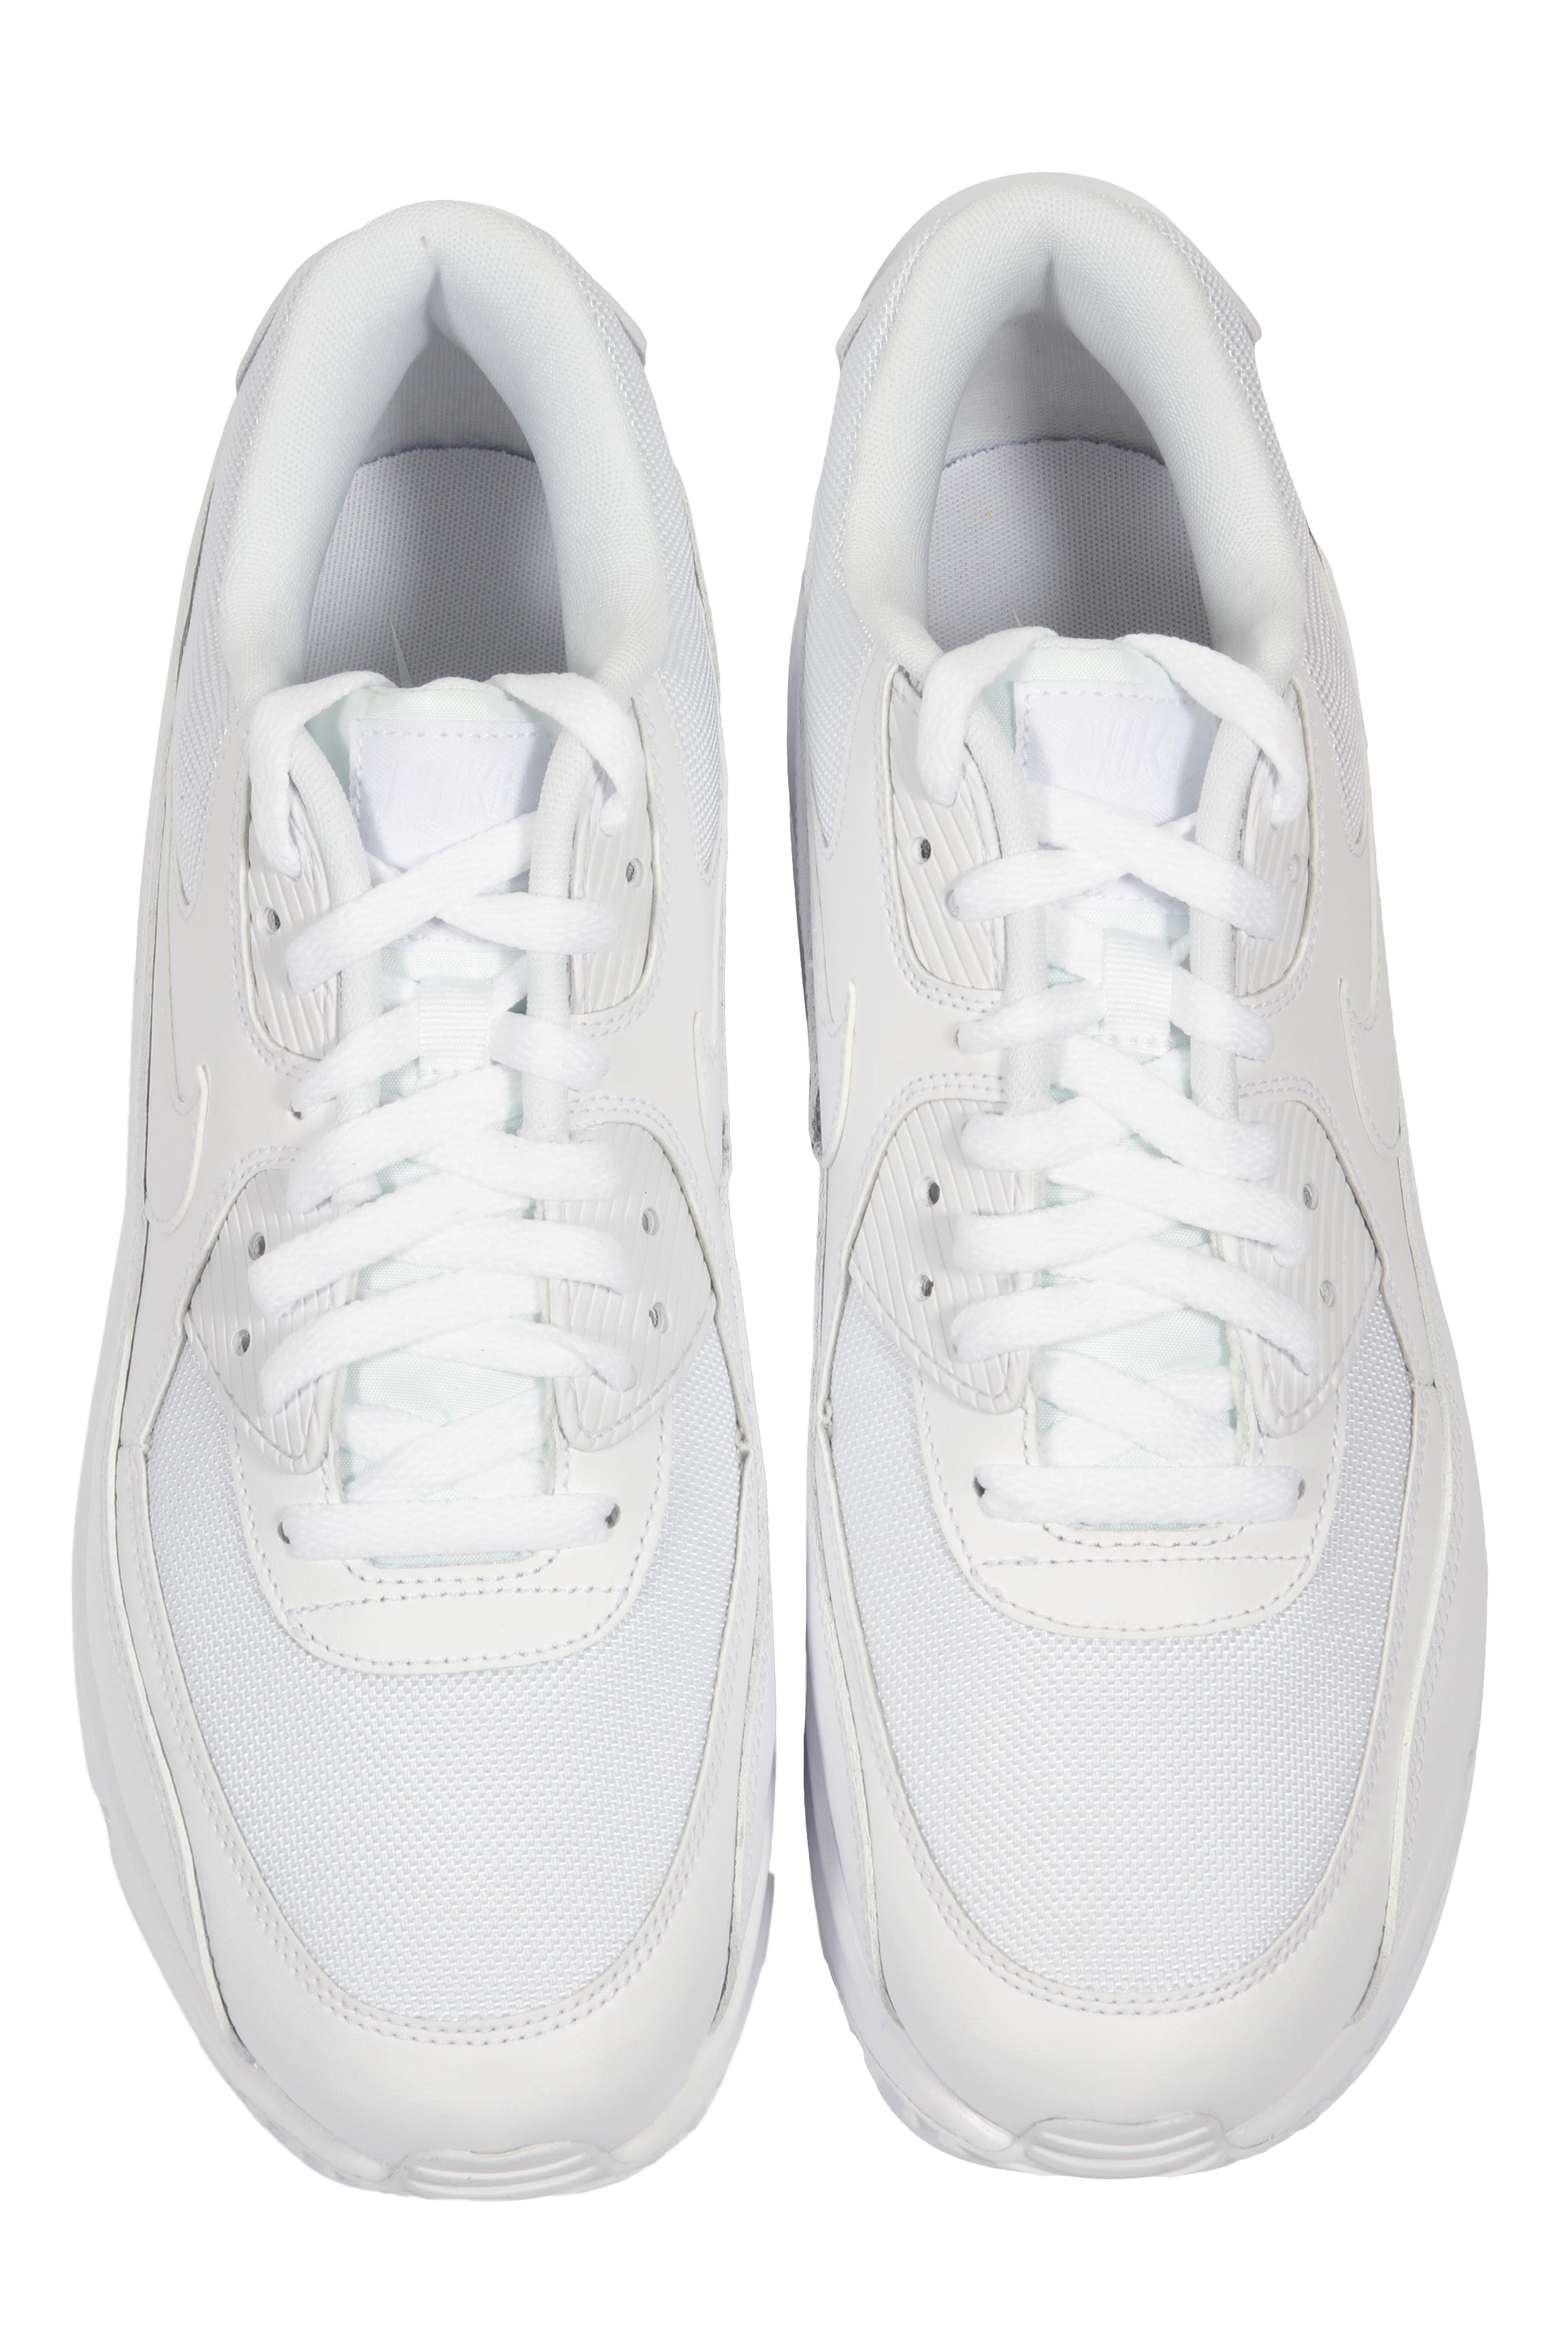 new product 0b1ba 7daea ... Nike Air Max 90 Essential Men s Running Running Running Shoes 537384-111  4b6d34 ...